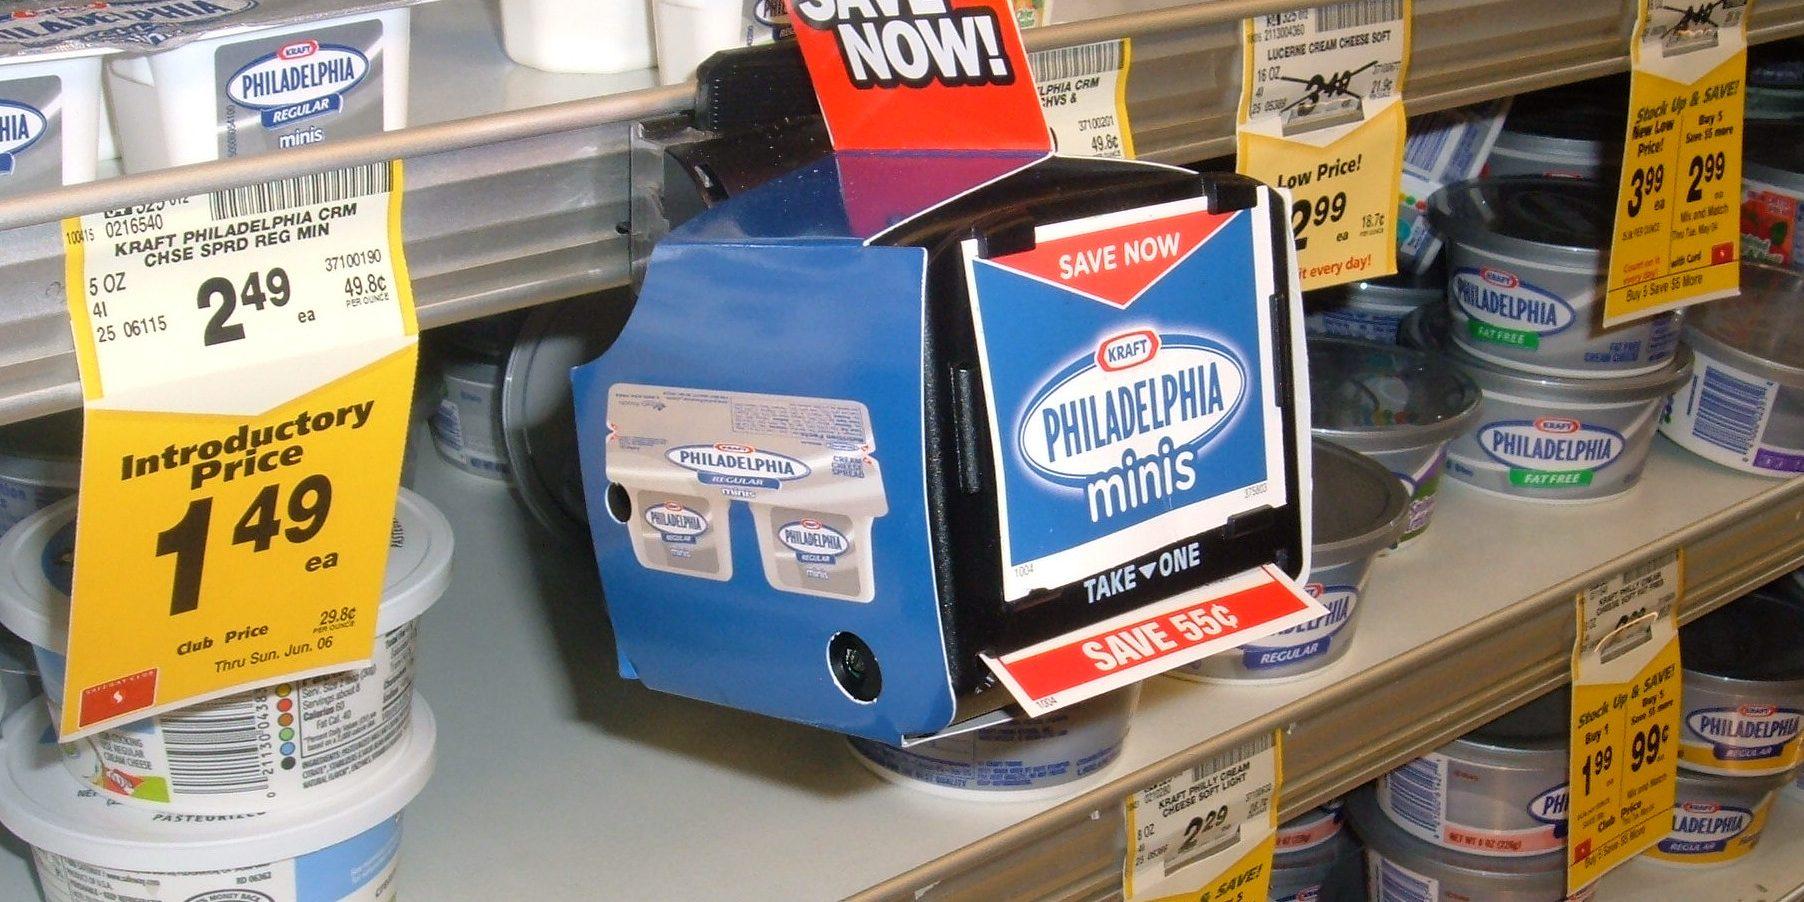 coupon blinkie machine